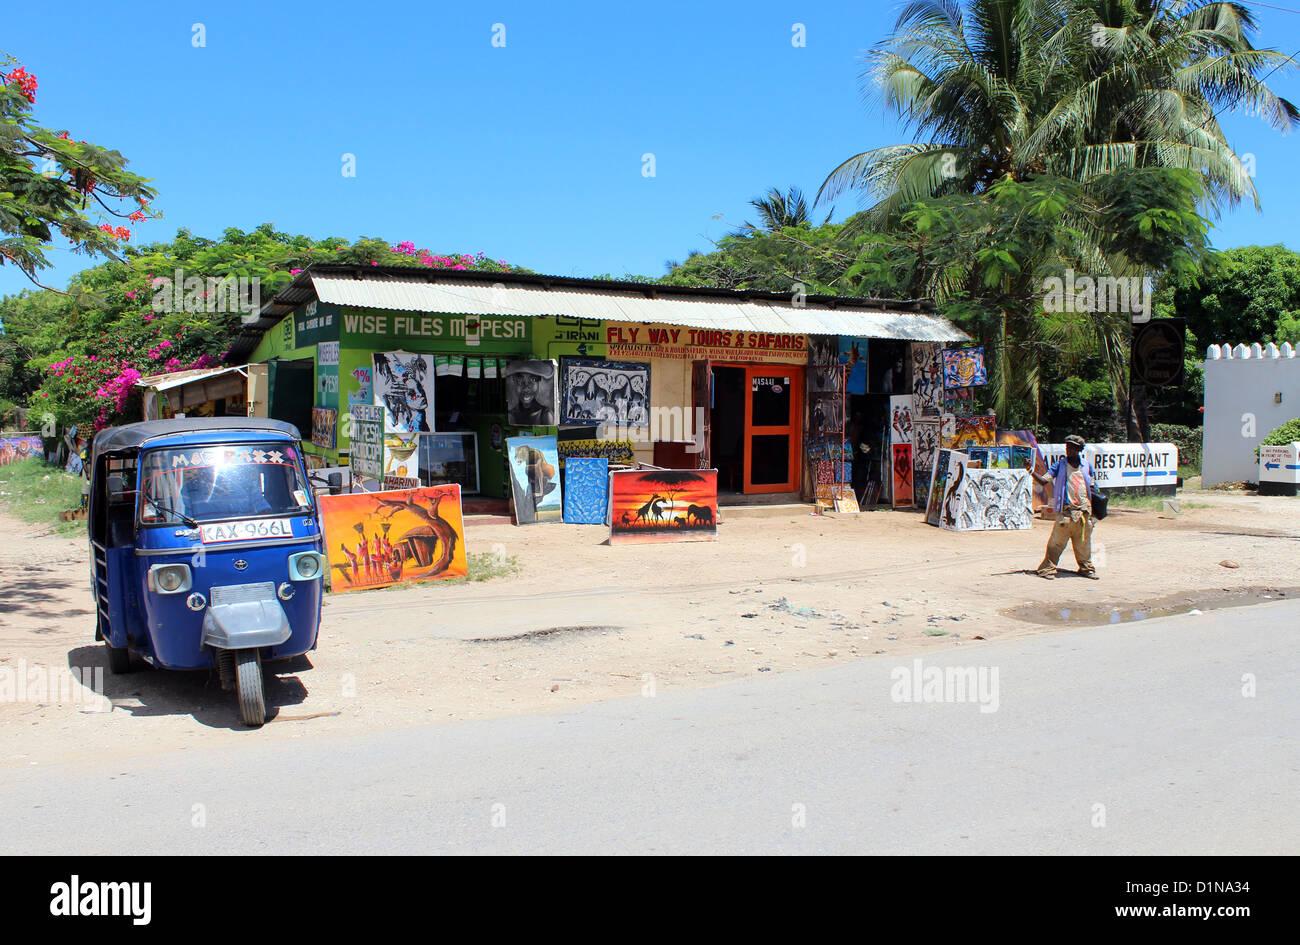 Tourist market with handmade art for sale, Kenya, East Africa - Stock Image